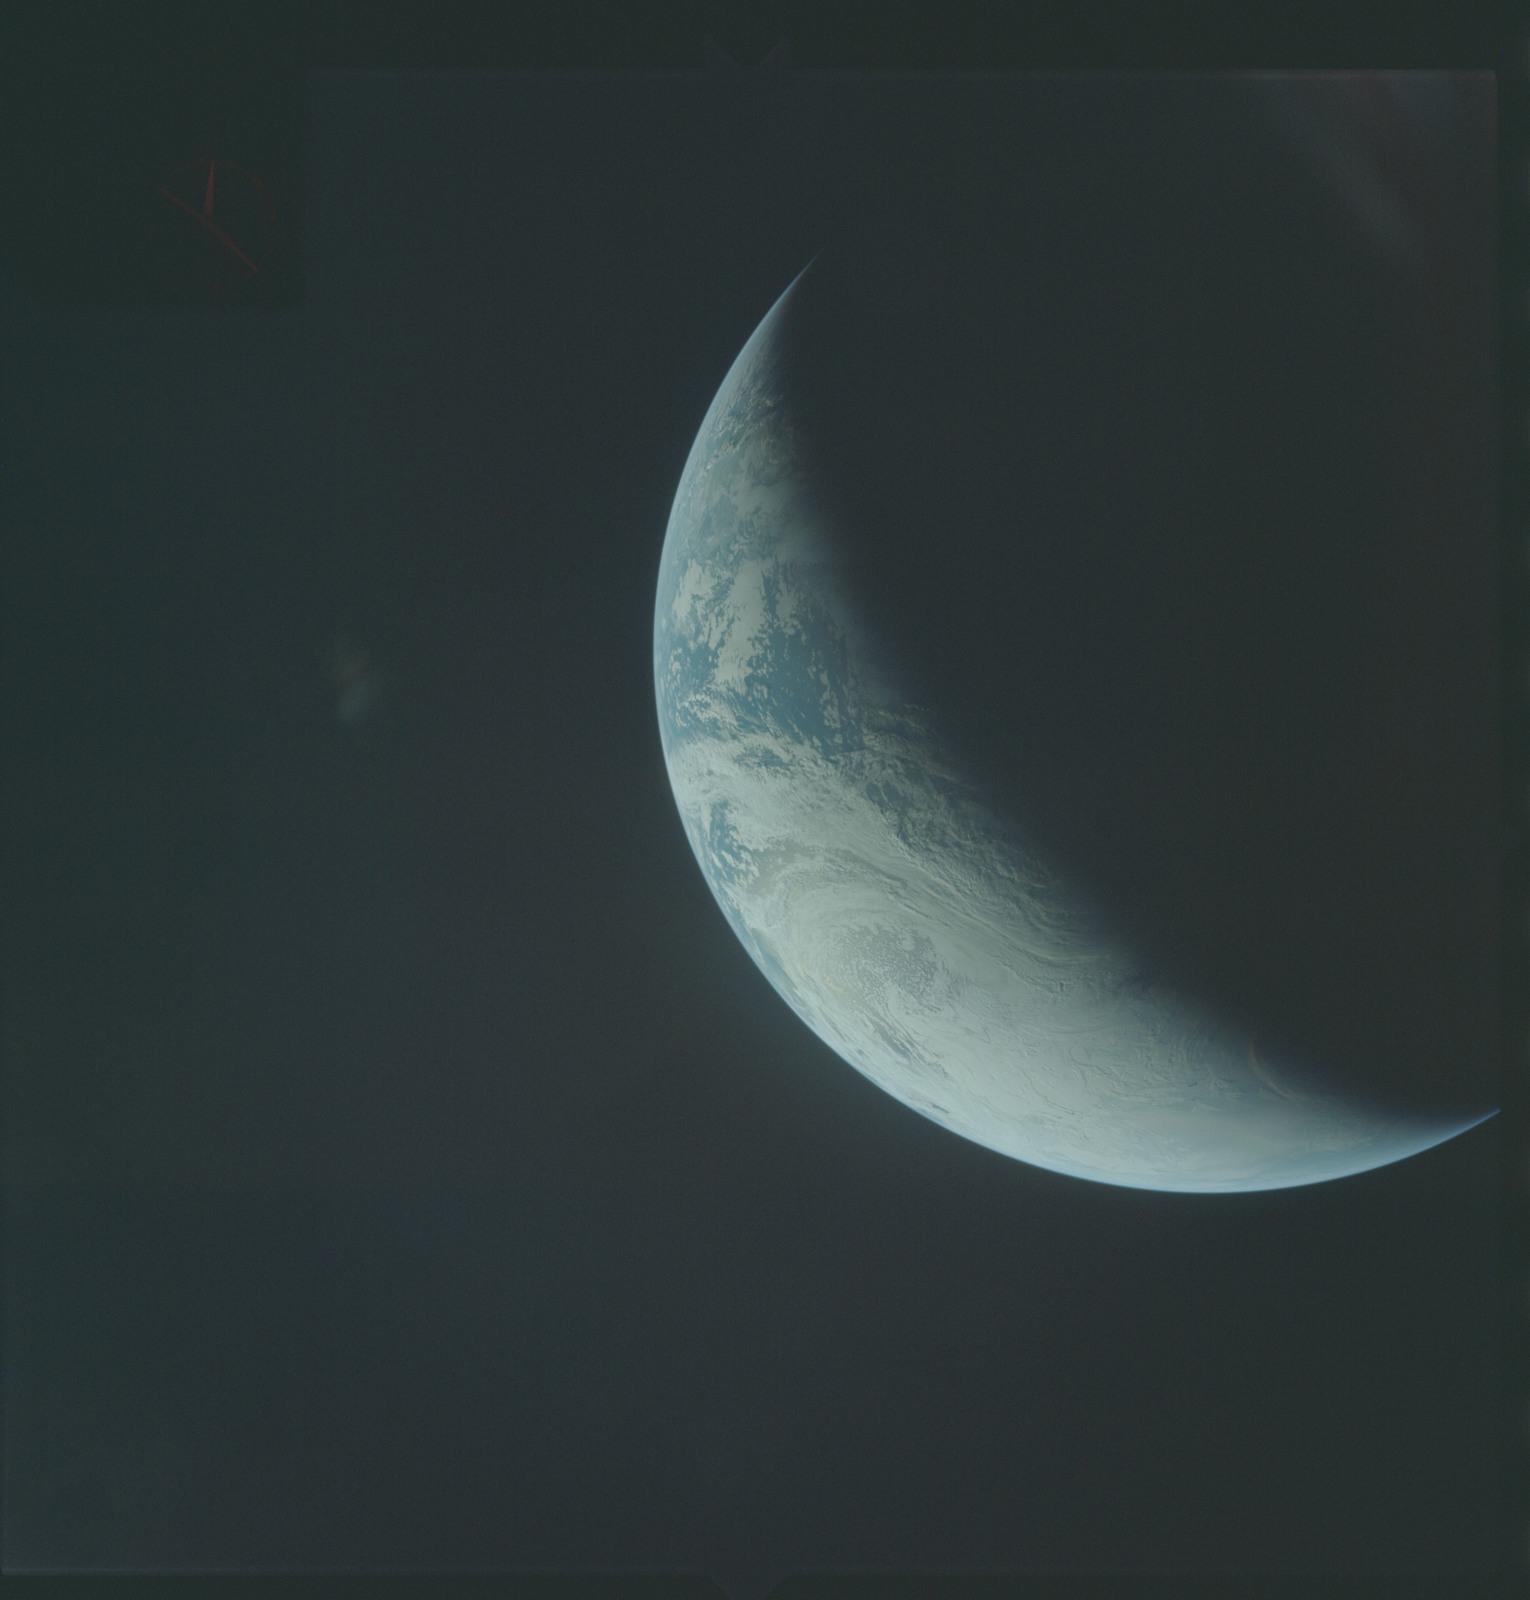 AS04-01-411 - Apollo 4 - Apollo 4 Mission - Atlantic Ocean,coastal Brazil,West Africa and Antarctica